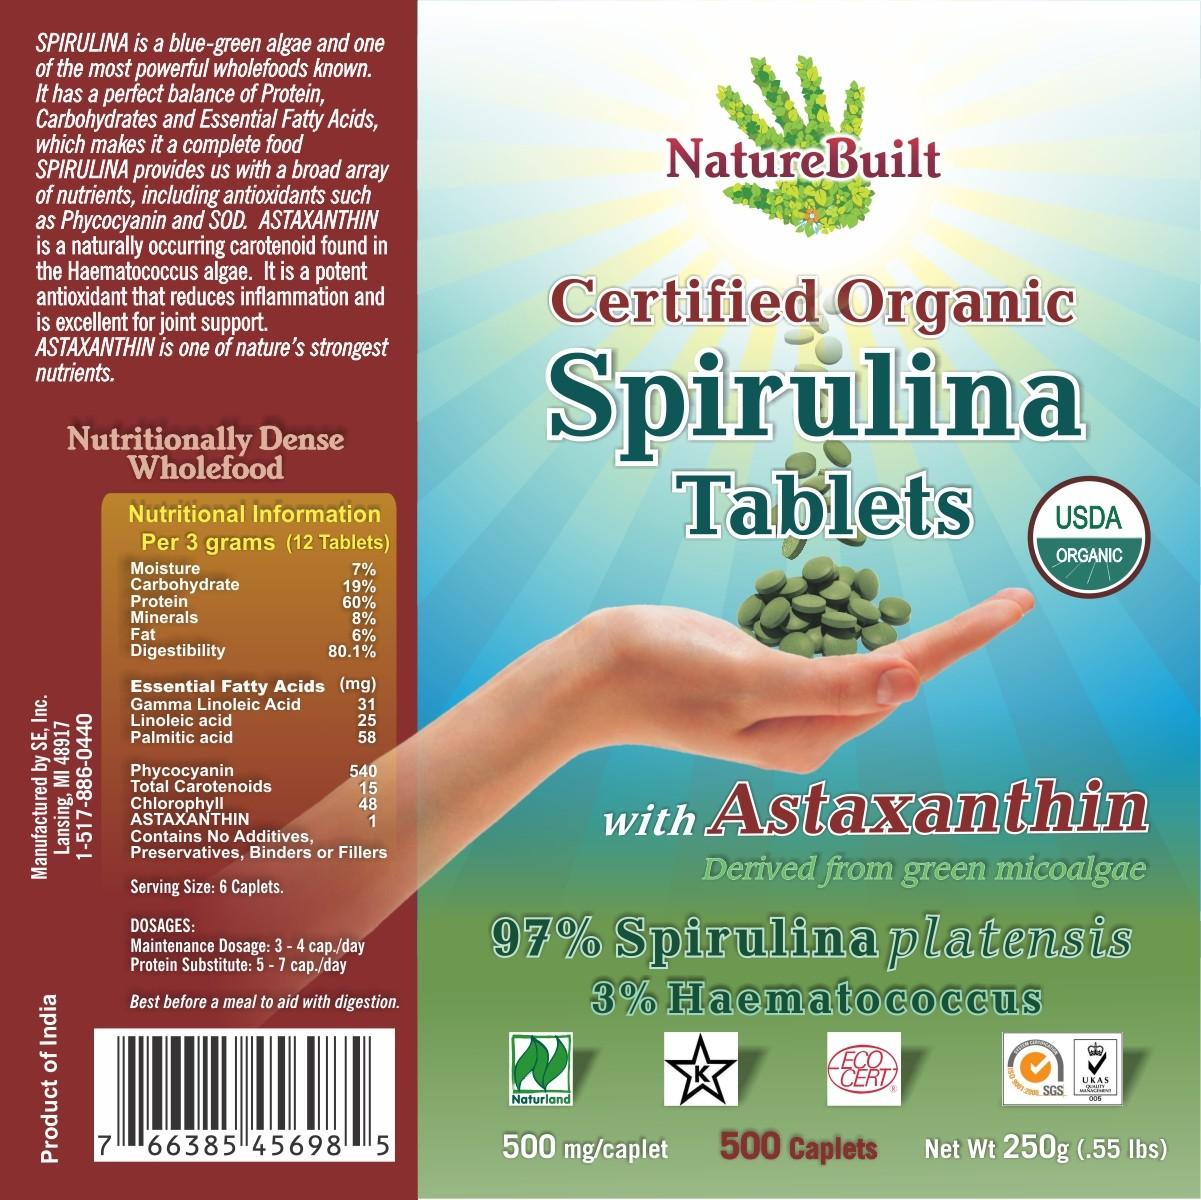 USDA Organic Spirulina with Astaxanthin *EXPIRED